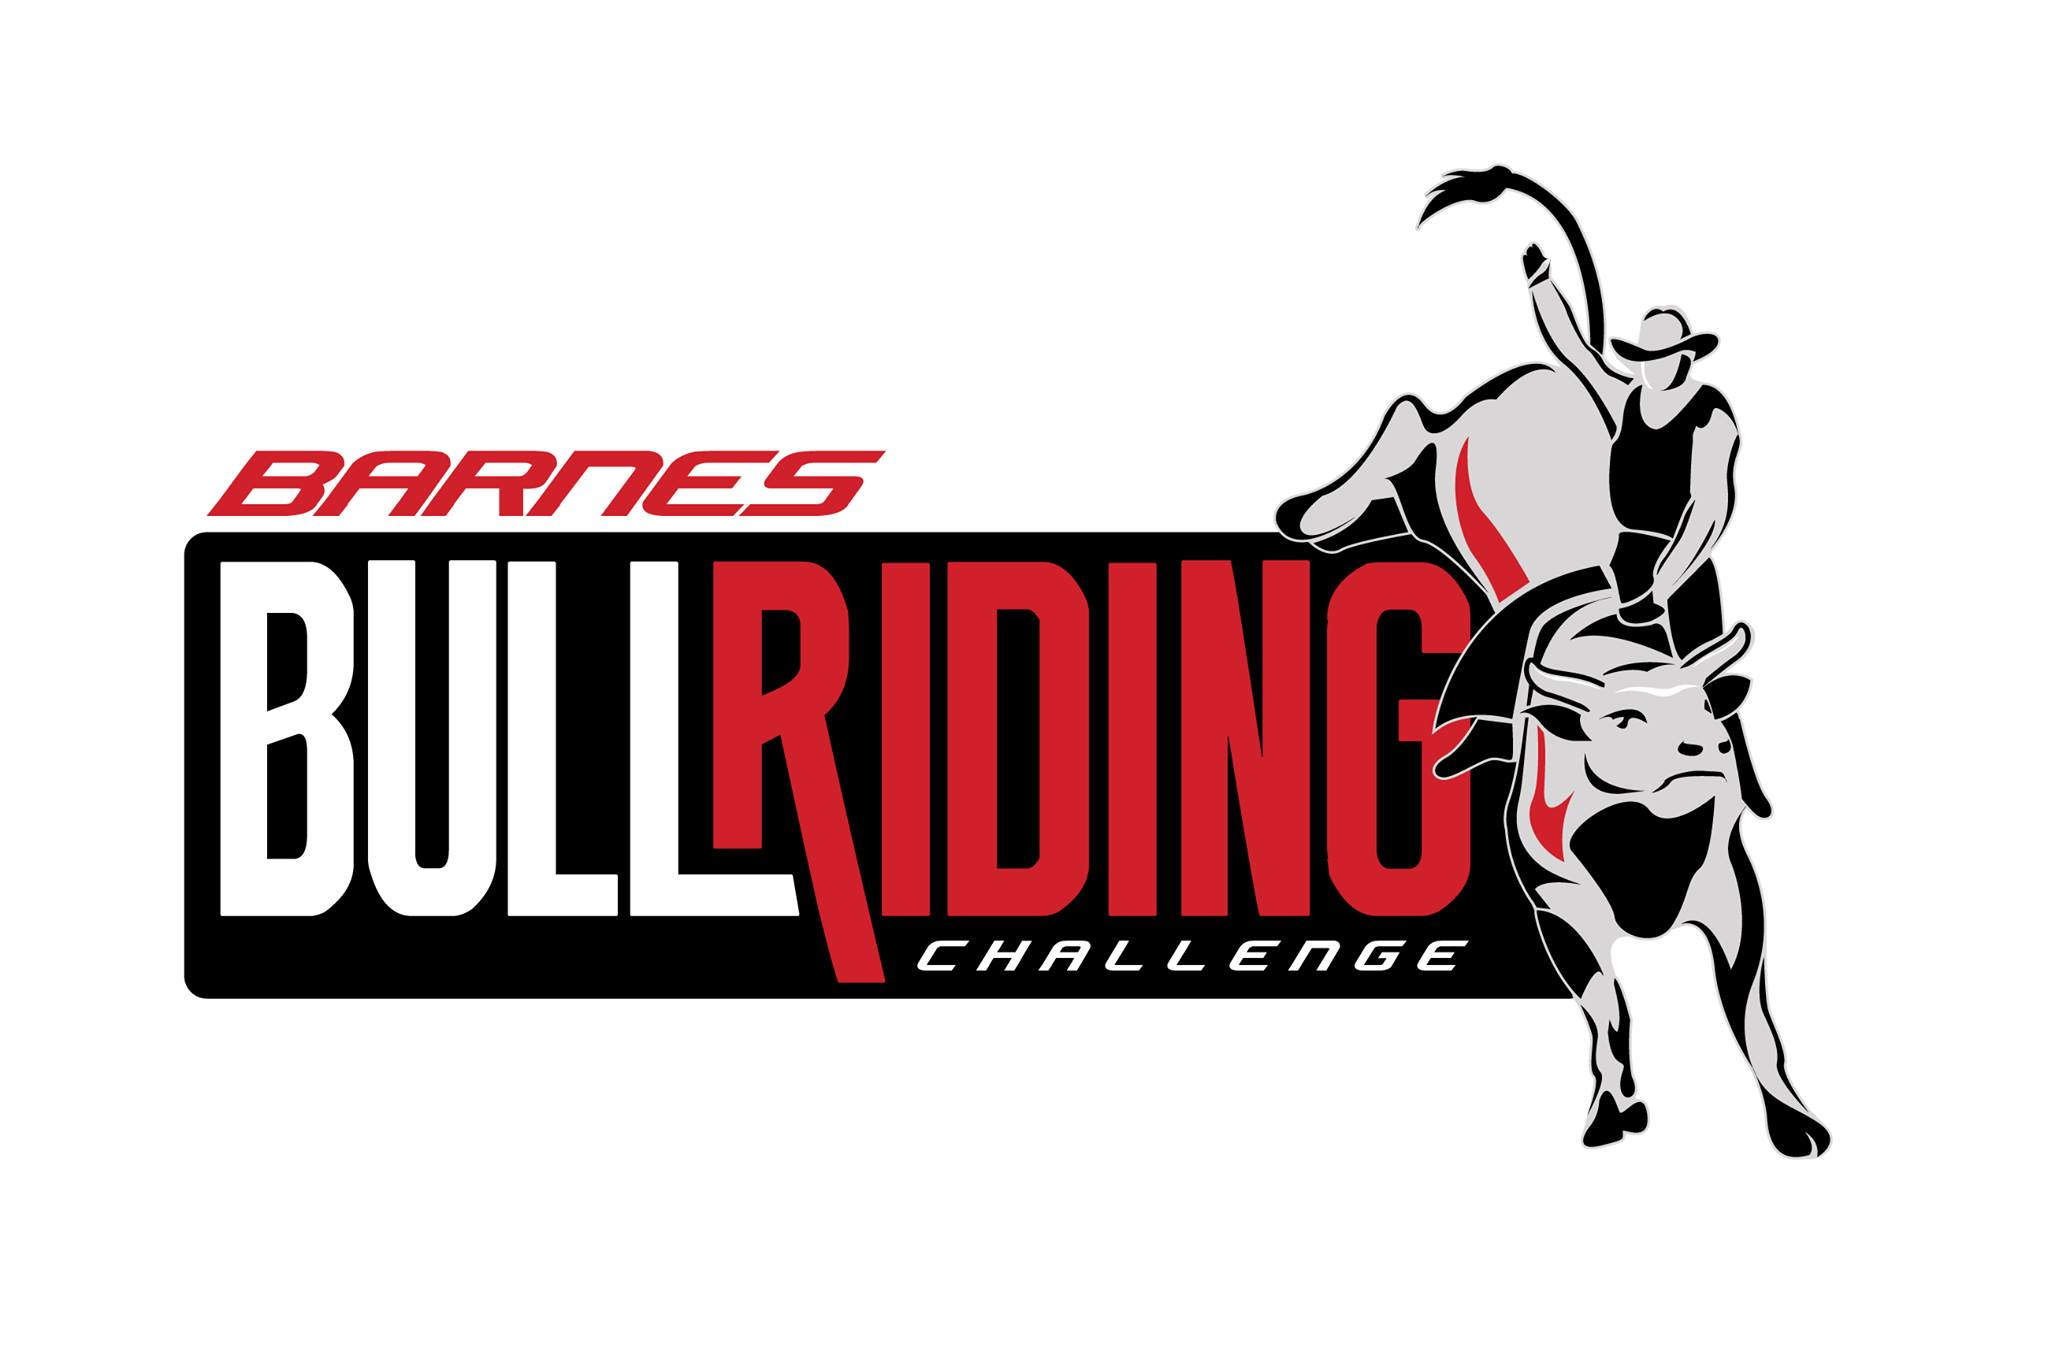 Barnes Bull Challenge